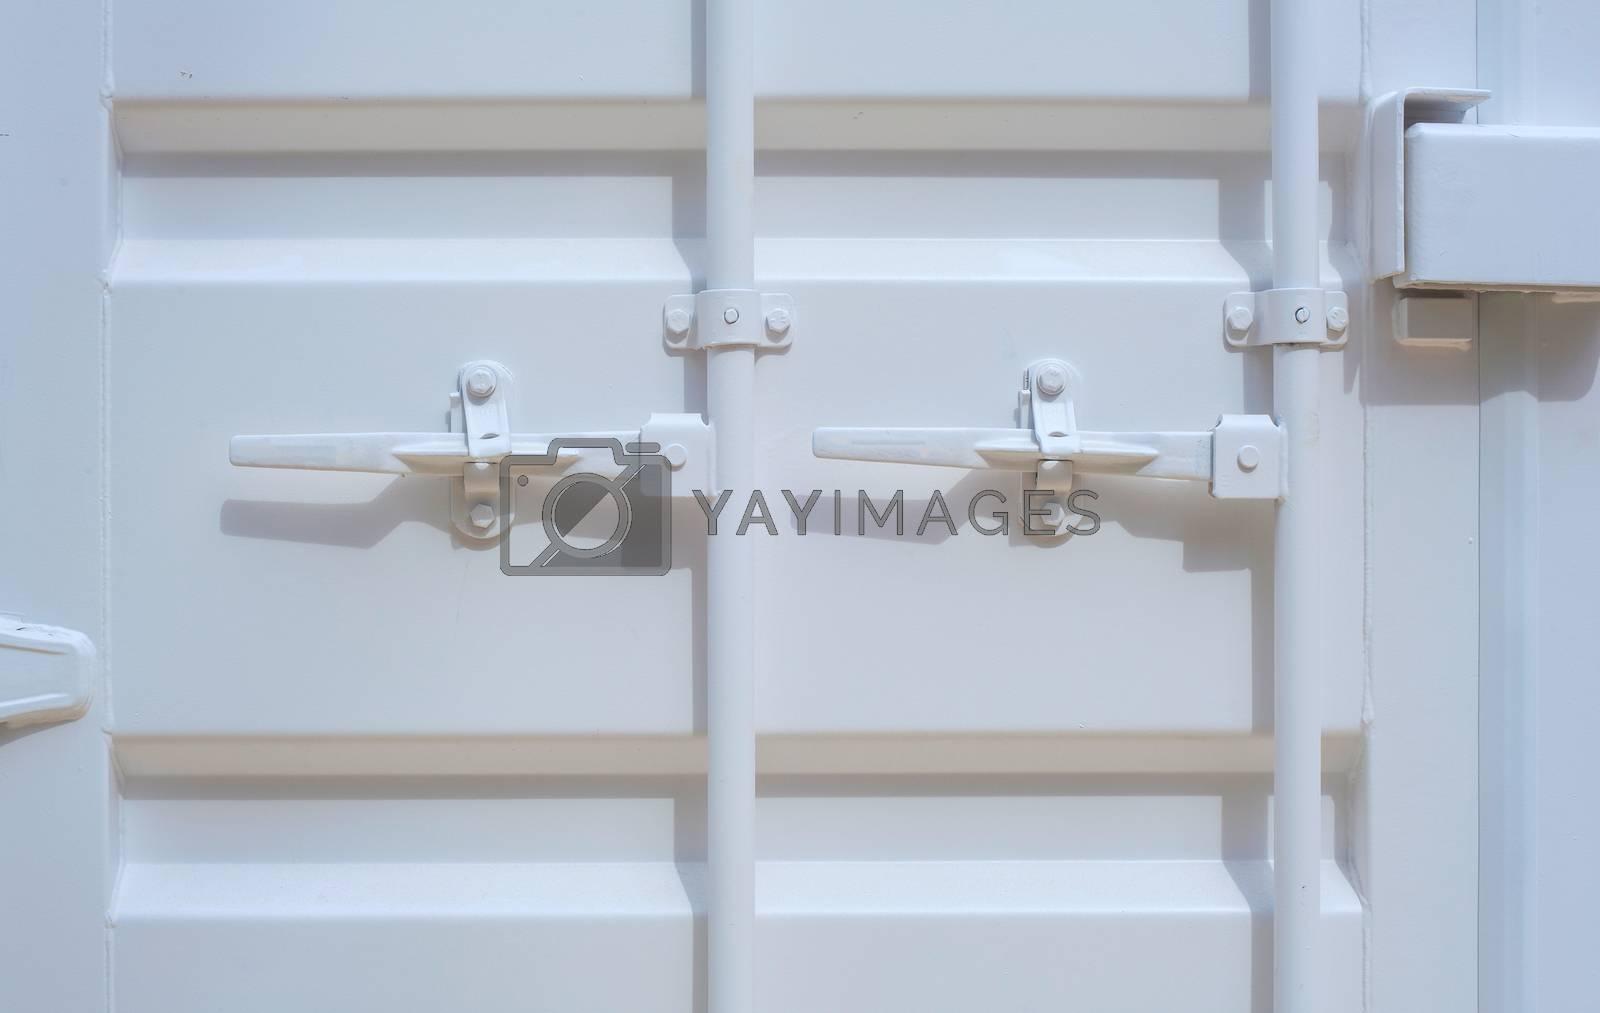 View of iron white door with iron handle